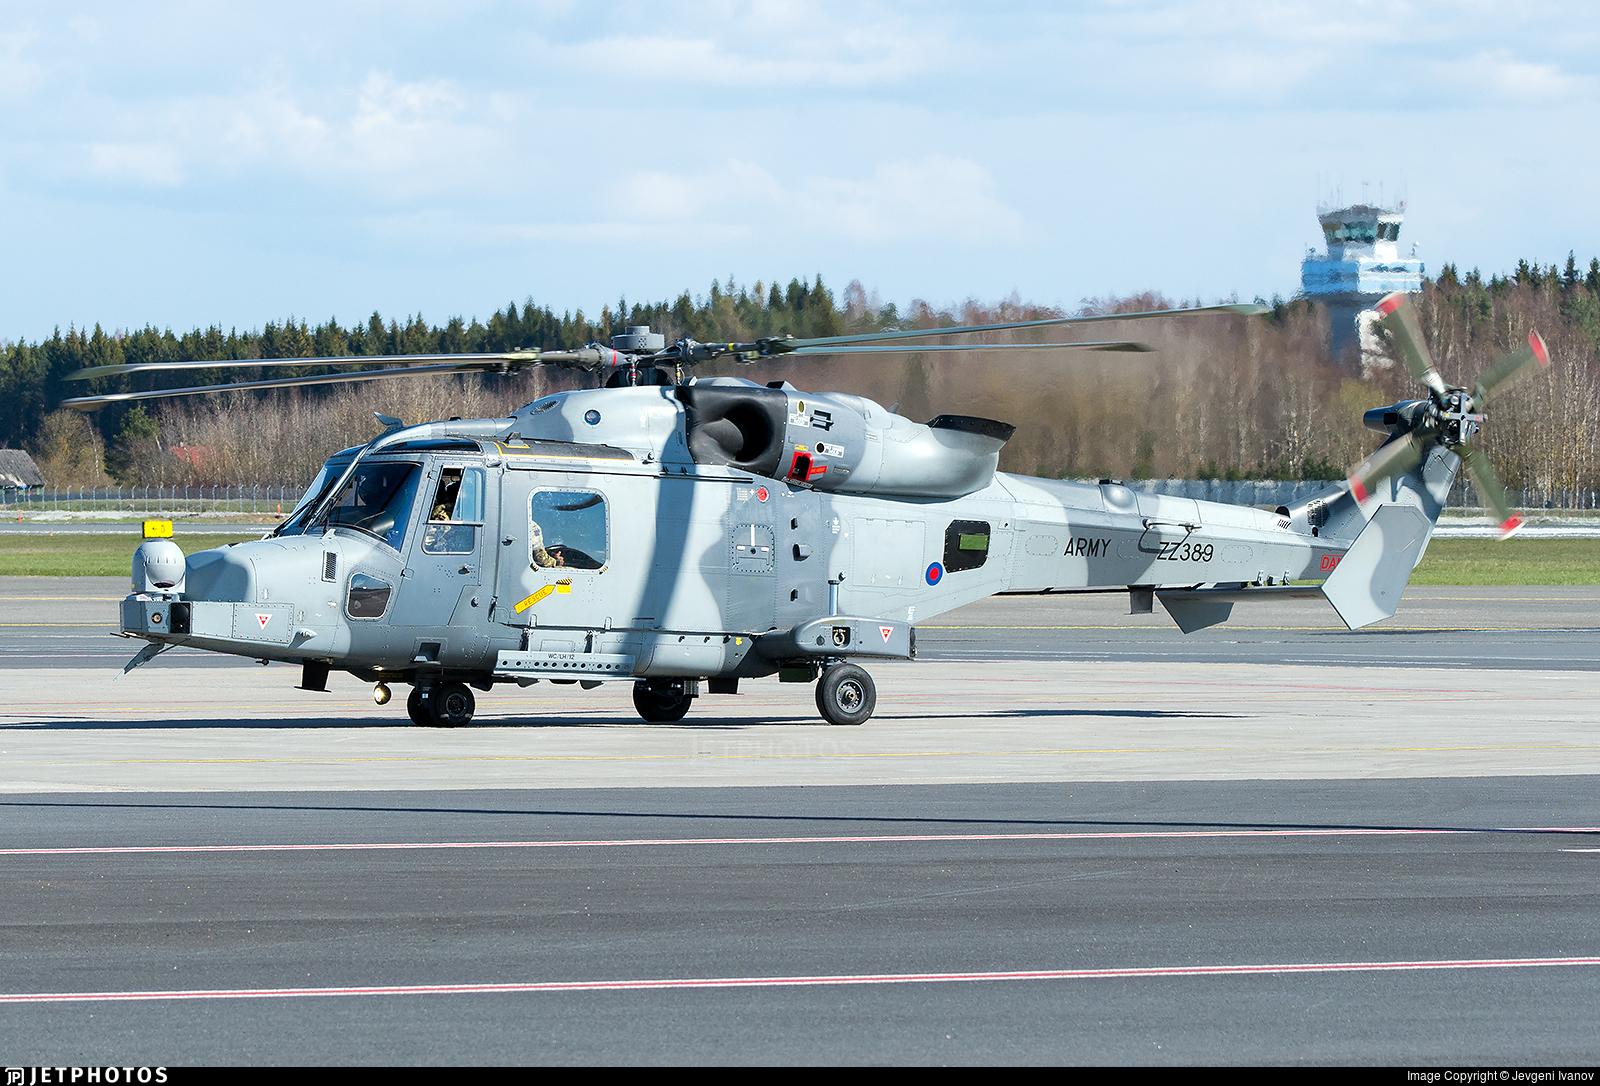 ZZ389 - Agusta-Westland AW-159 Wildcat AH.1 - United Kingdom - Army Air Corps